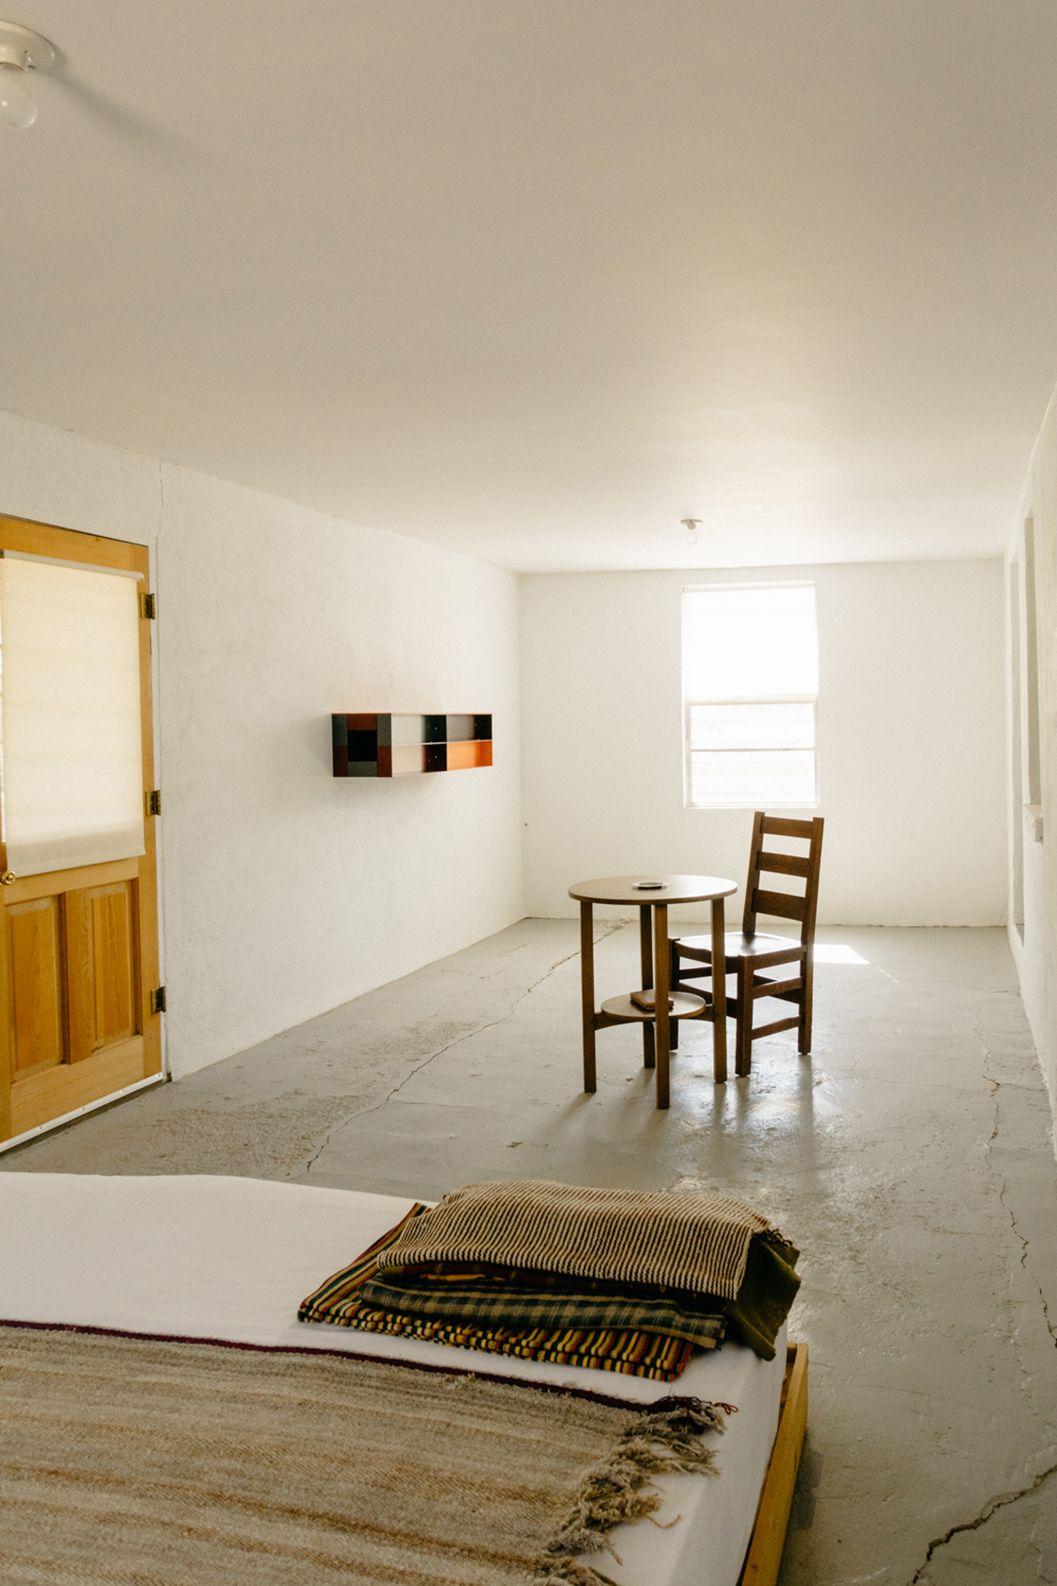 Donald Judd's Las Casas Ranch in Apartamento Magazine ... | 1057 x 1586 jpeg 157kB